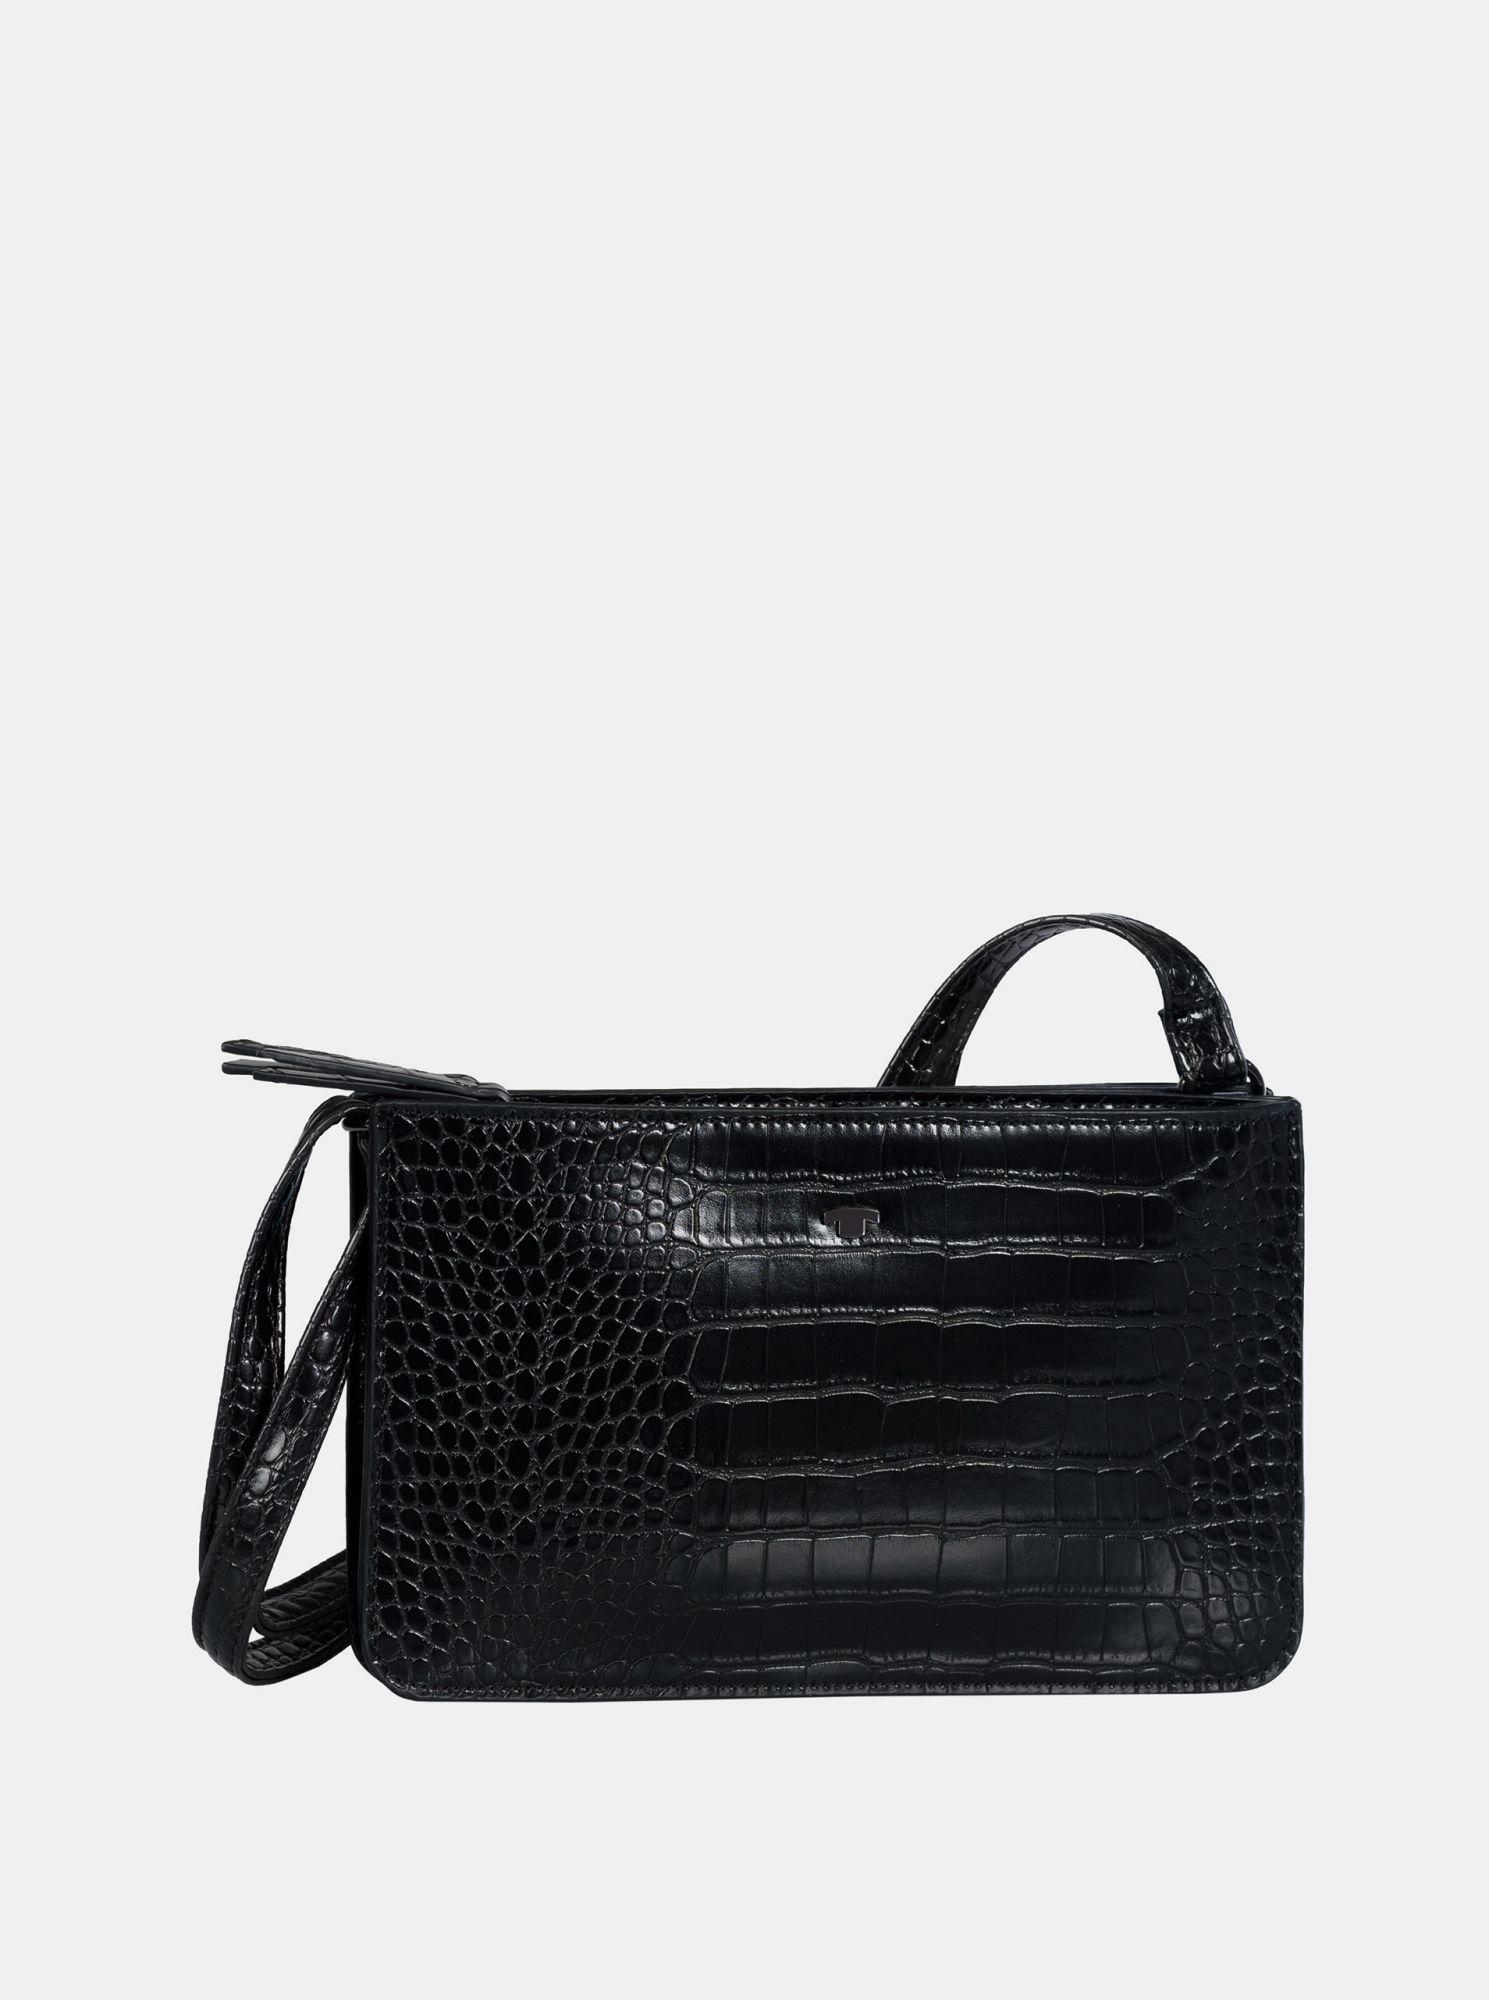 Černá crossbody kabelka s krokodýlím vzorem Tom Tailor